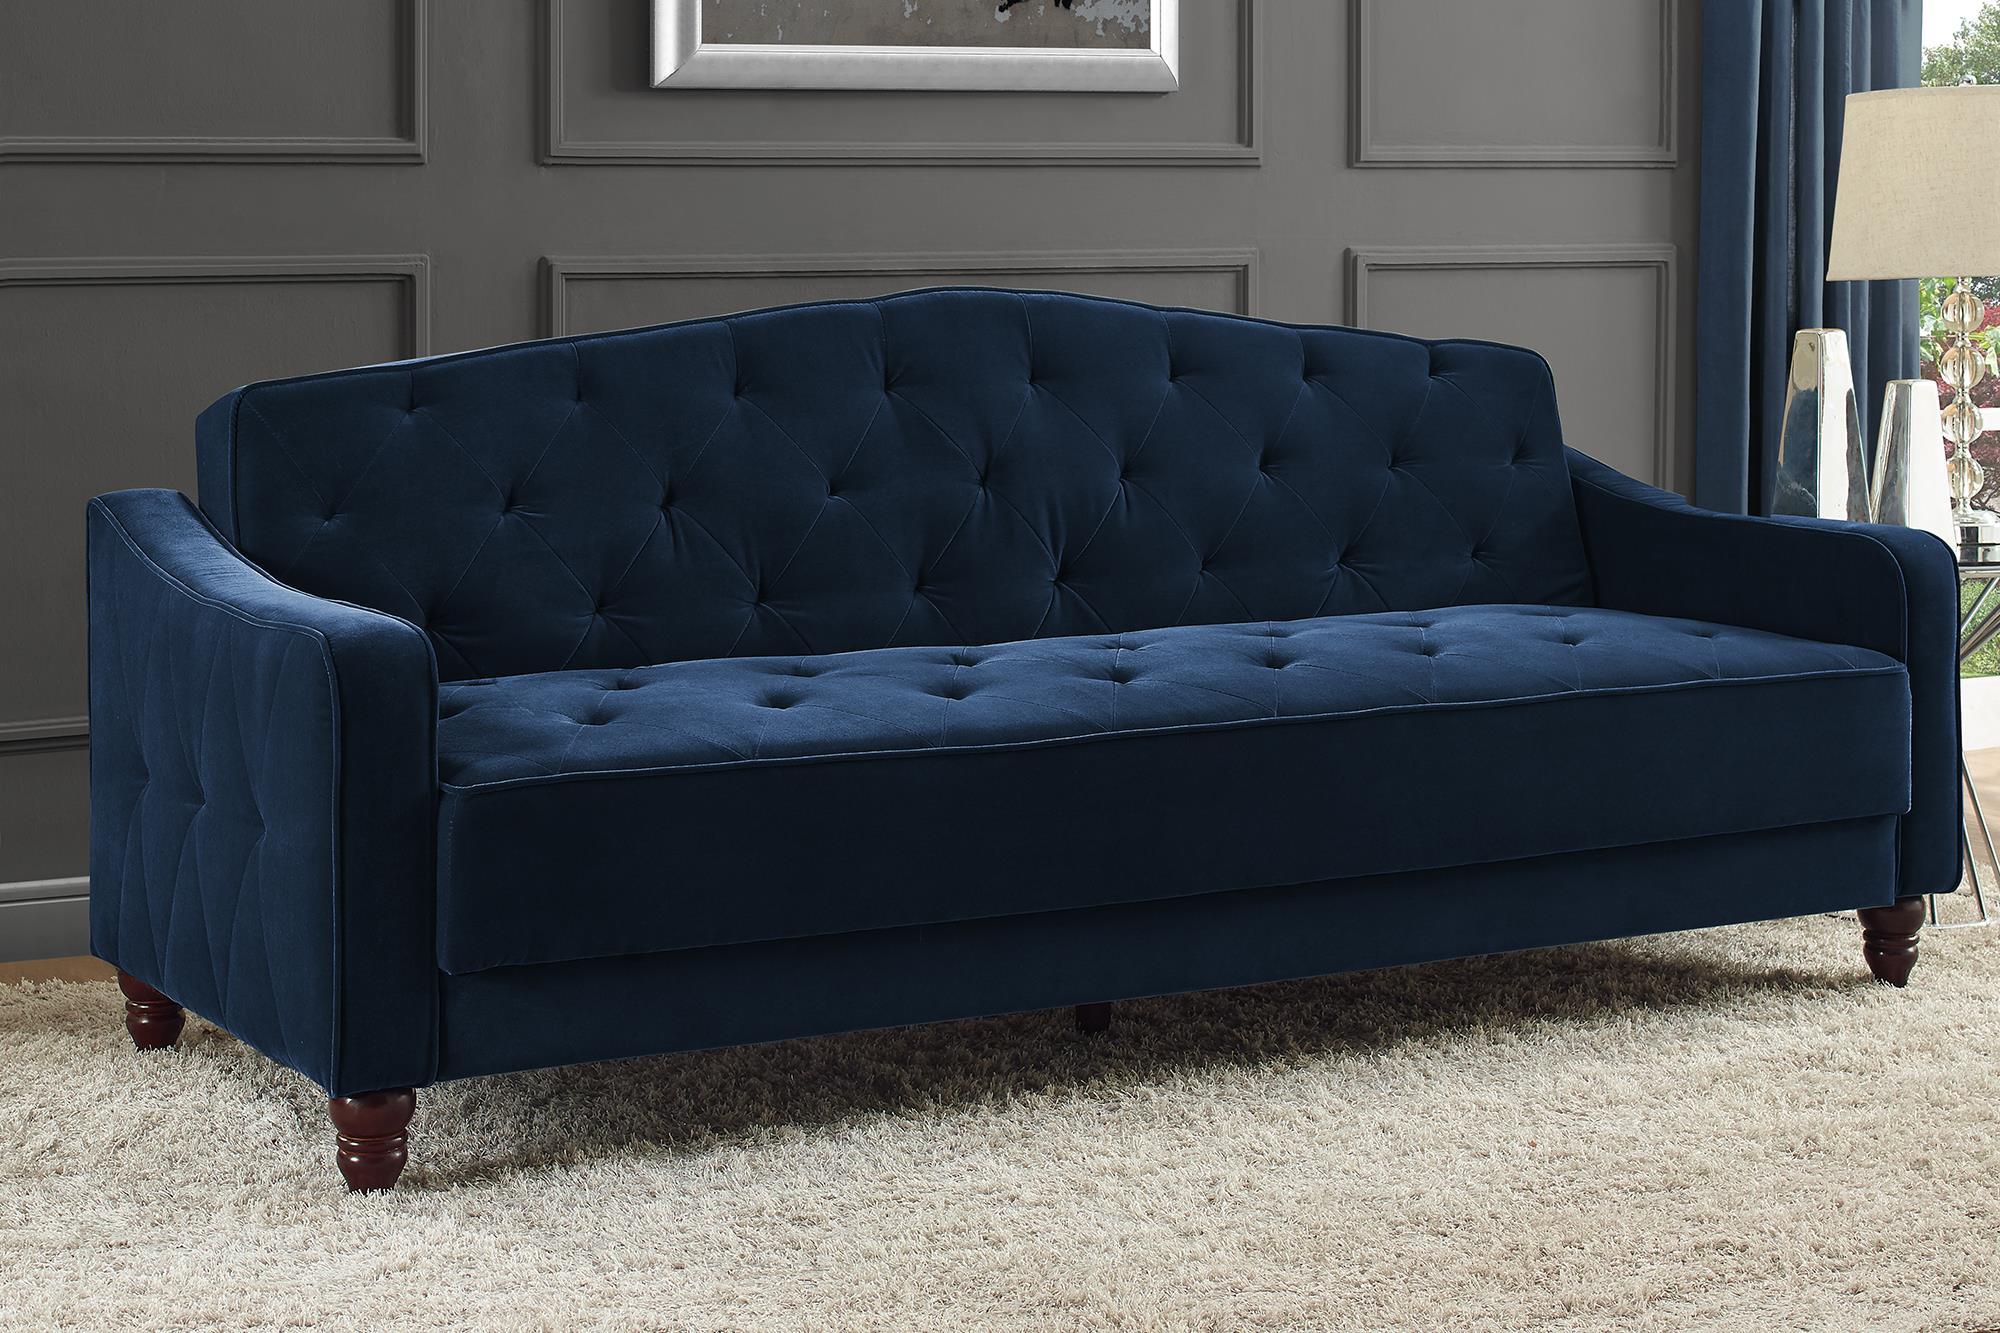 novogratz vintage tufted sofa sleeper ii, multiple colors ZSXFCBX